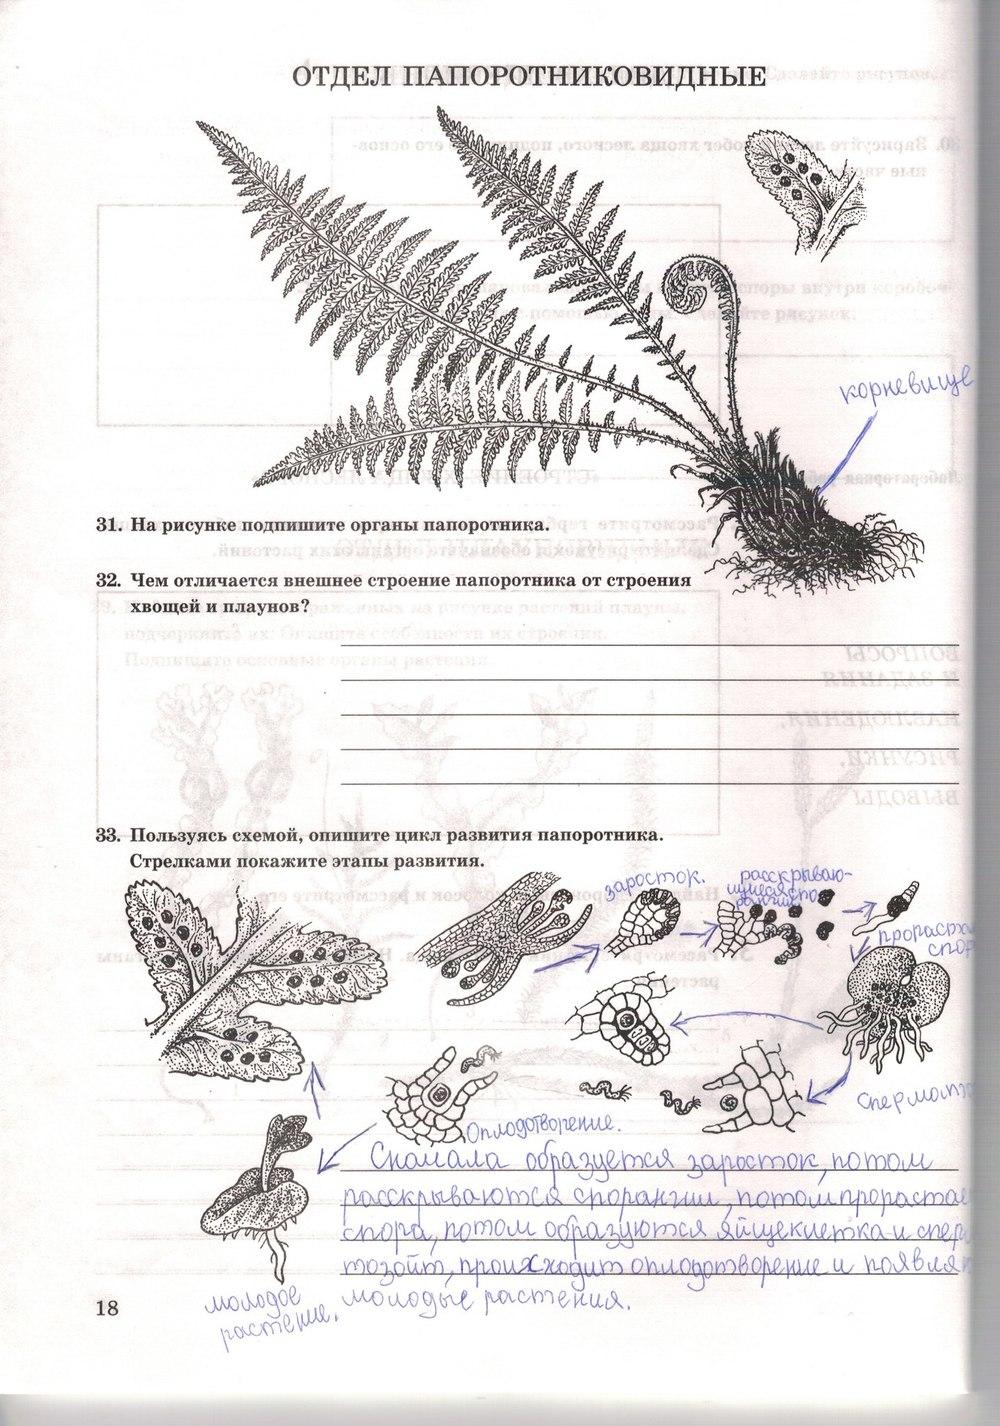 Биология 7 класс гдз в.б захаров н